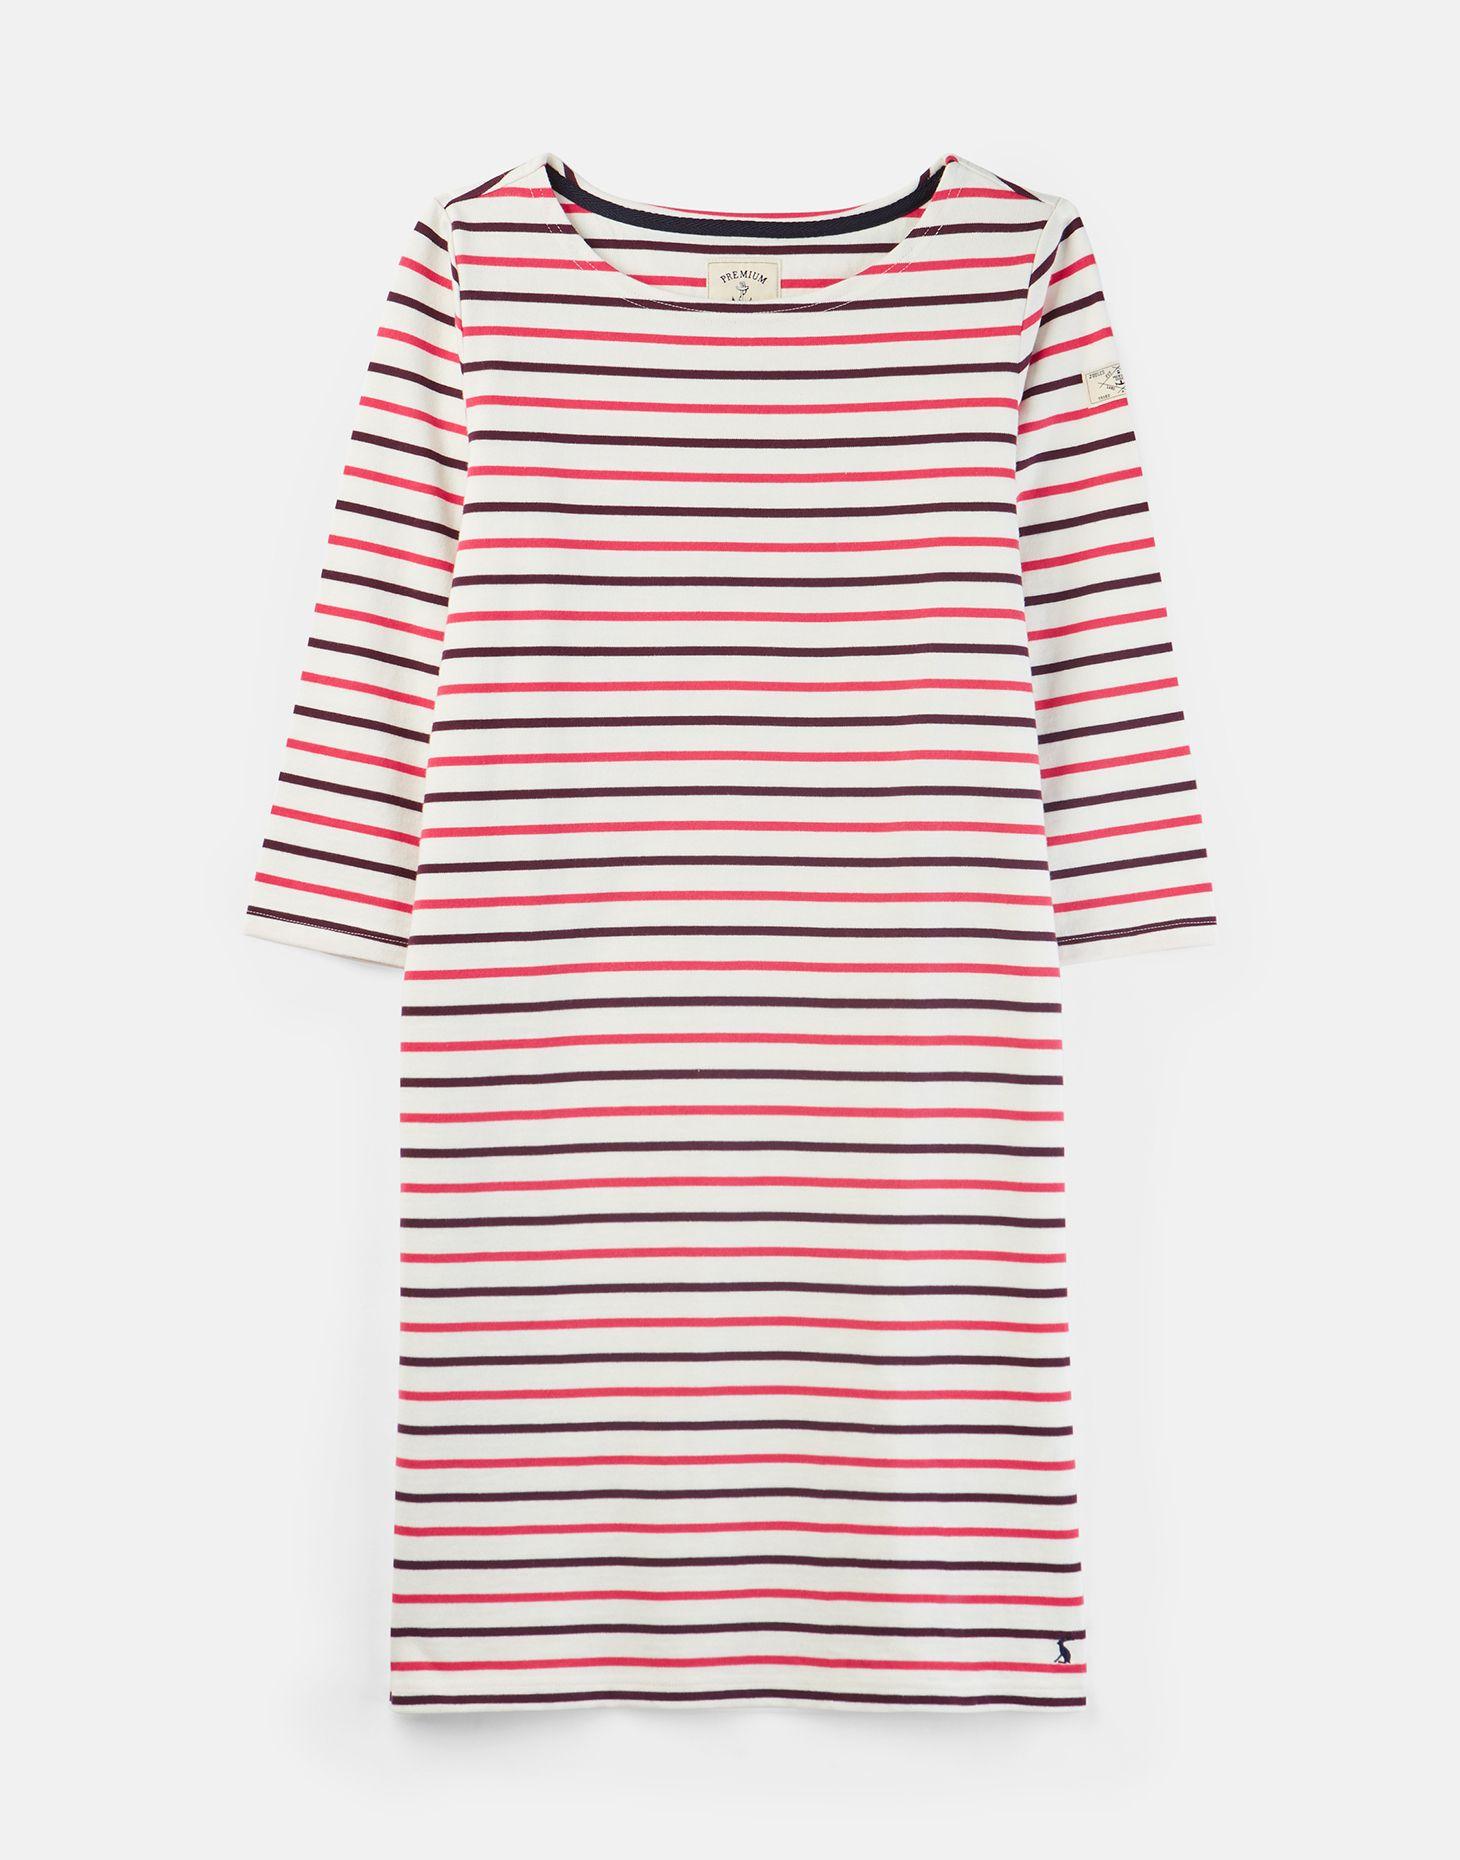 JOULES Riviera T-Shirt Dress Pink Stripe Sz 10 16 18 20 FreeUK P/&P